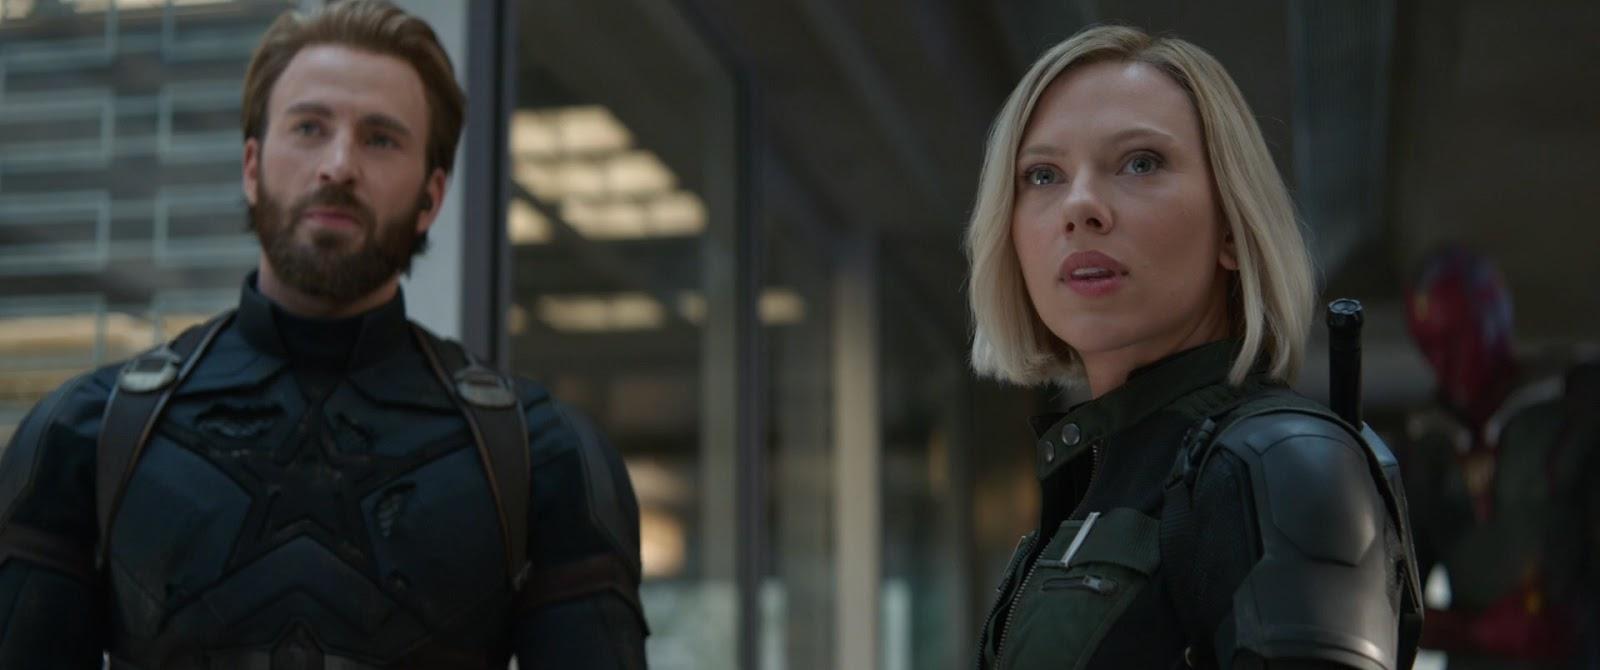 Avengers: Infinity War (2018) 2